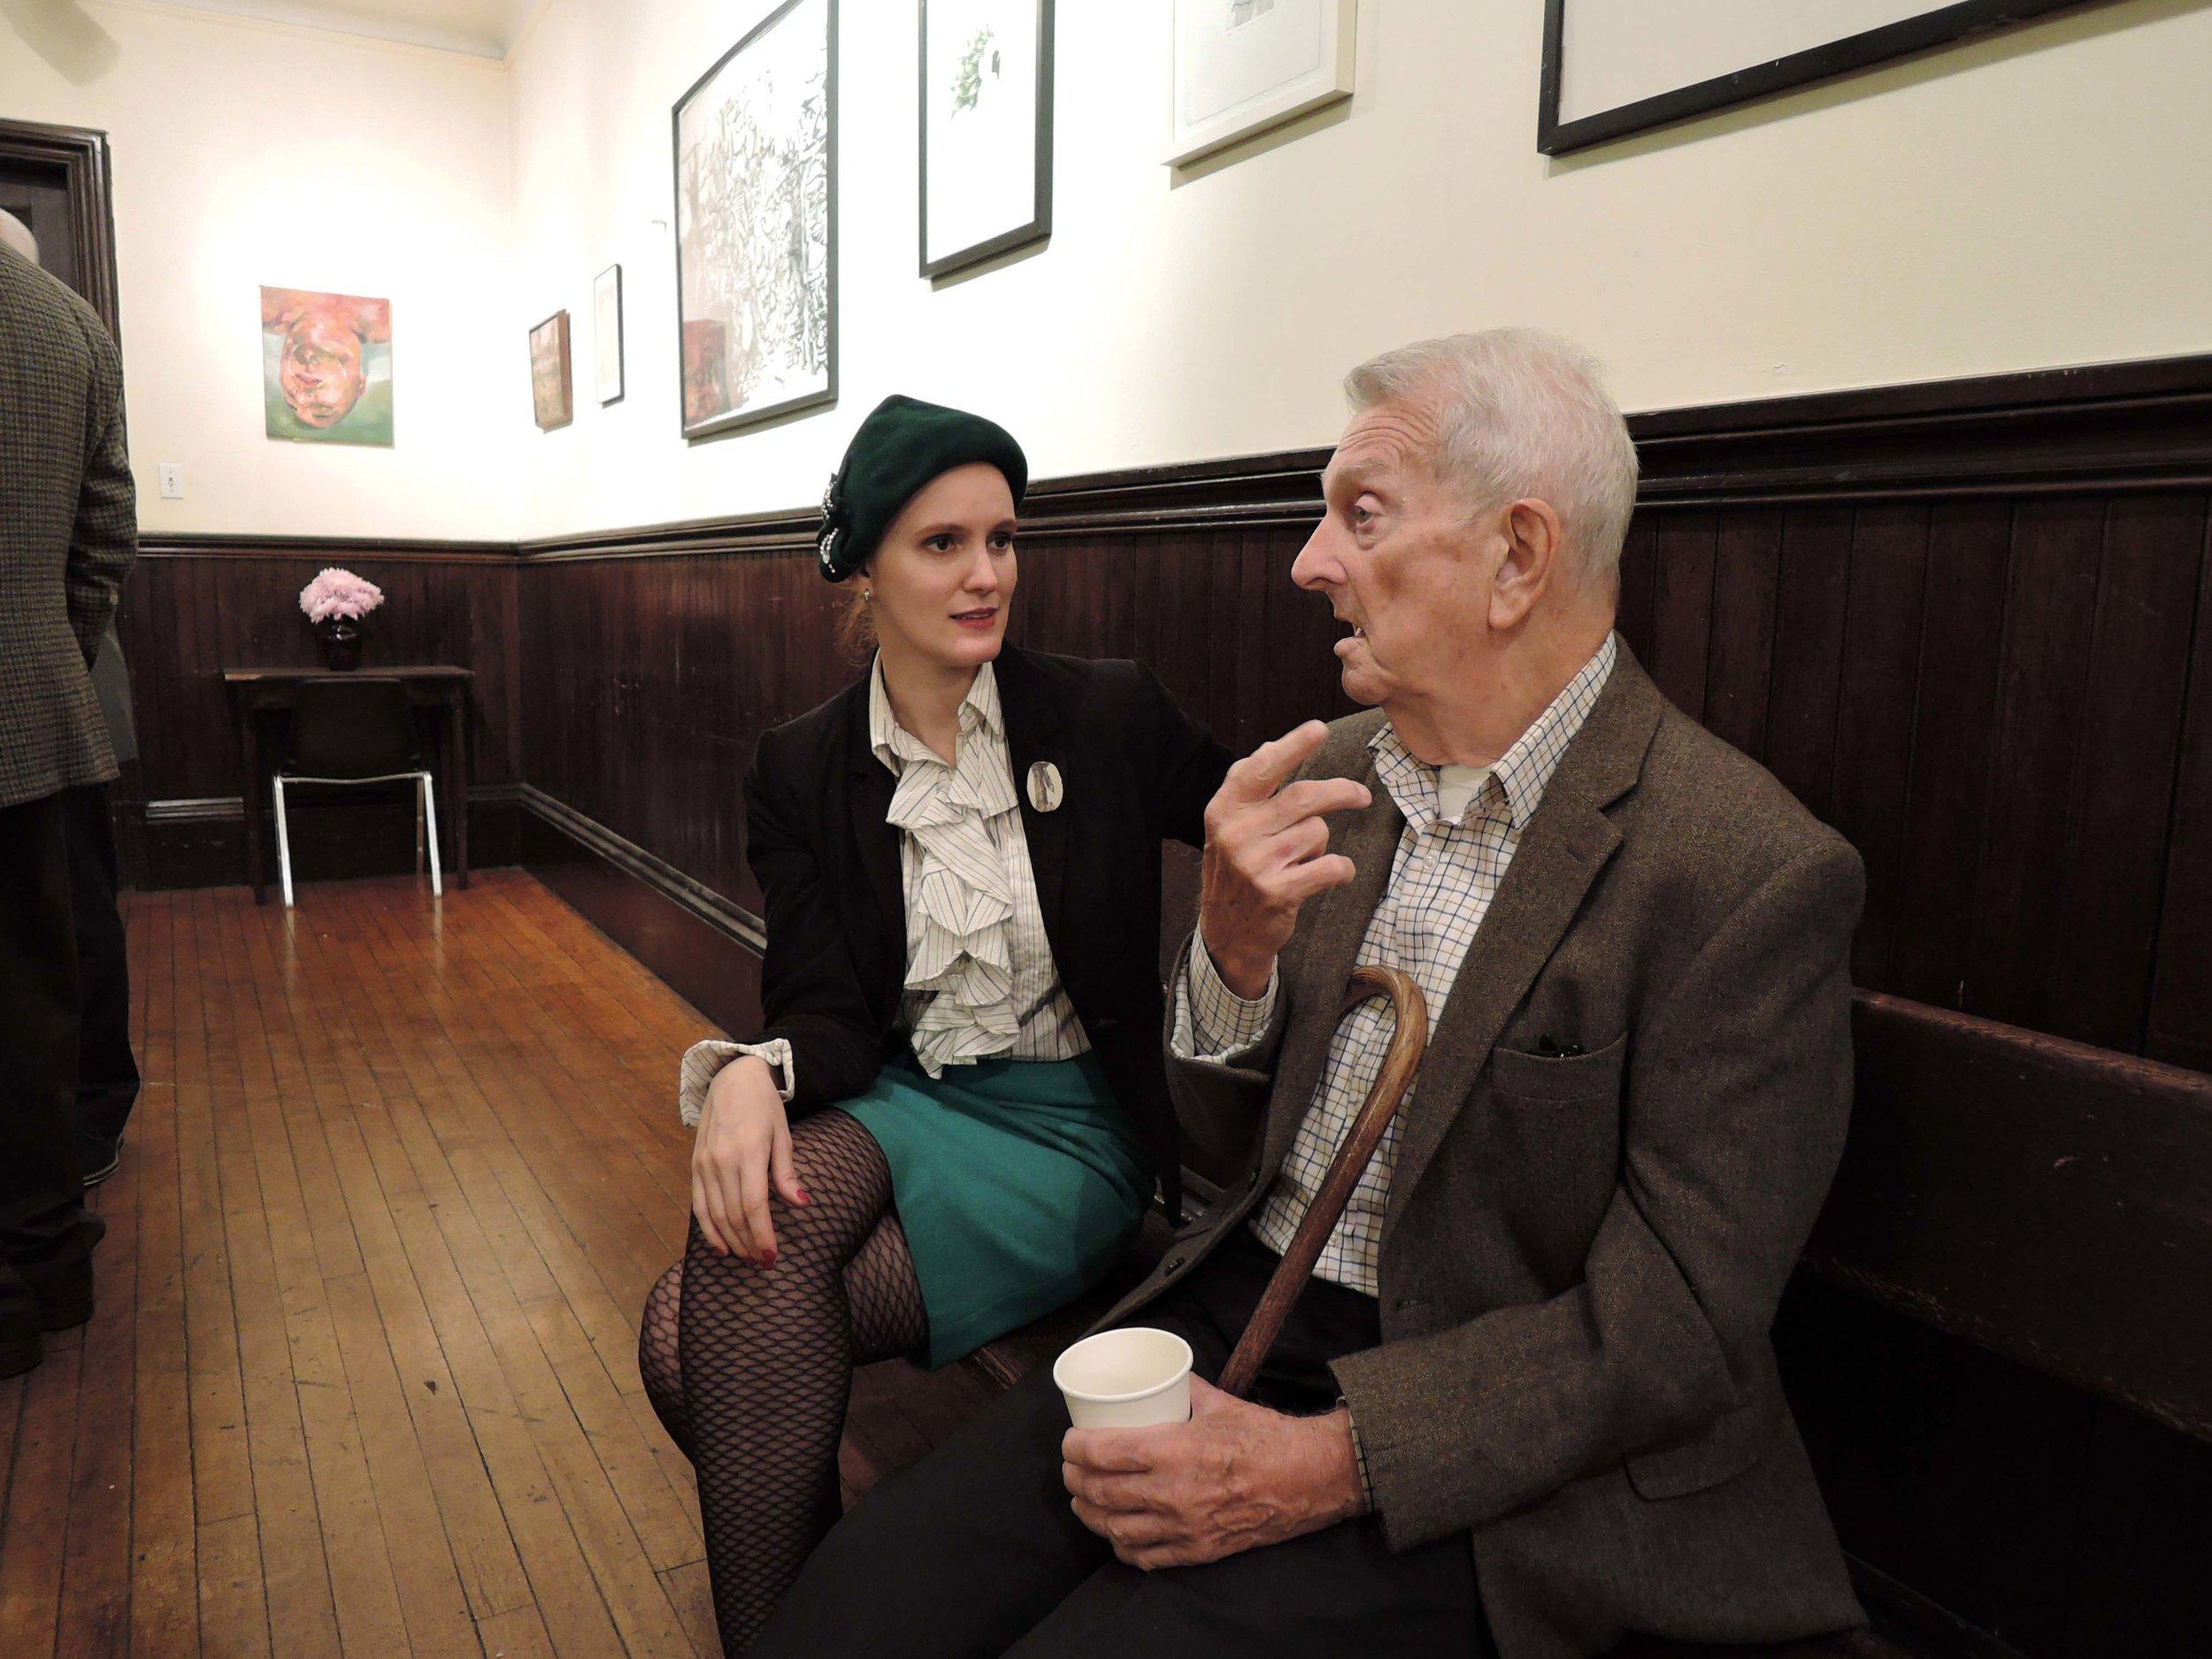 Parishioners J. Grace Mudd and Dick Leitsch